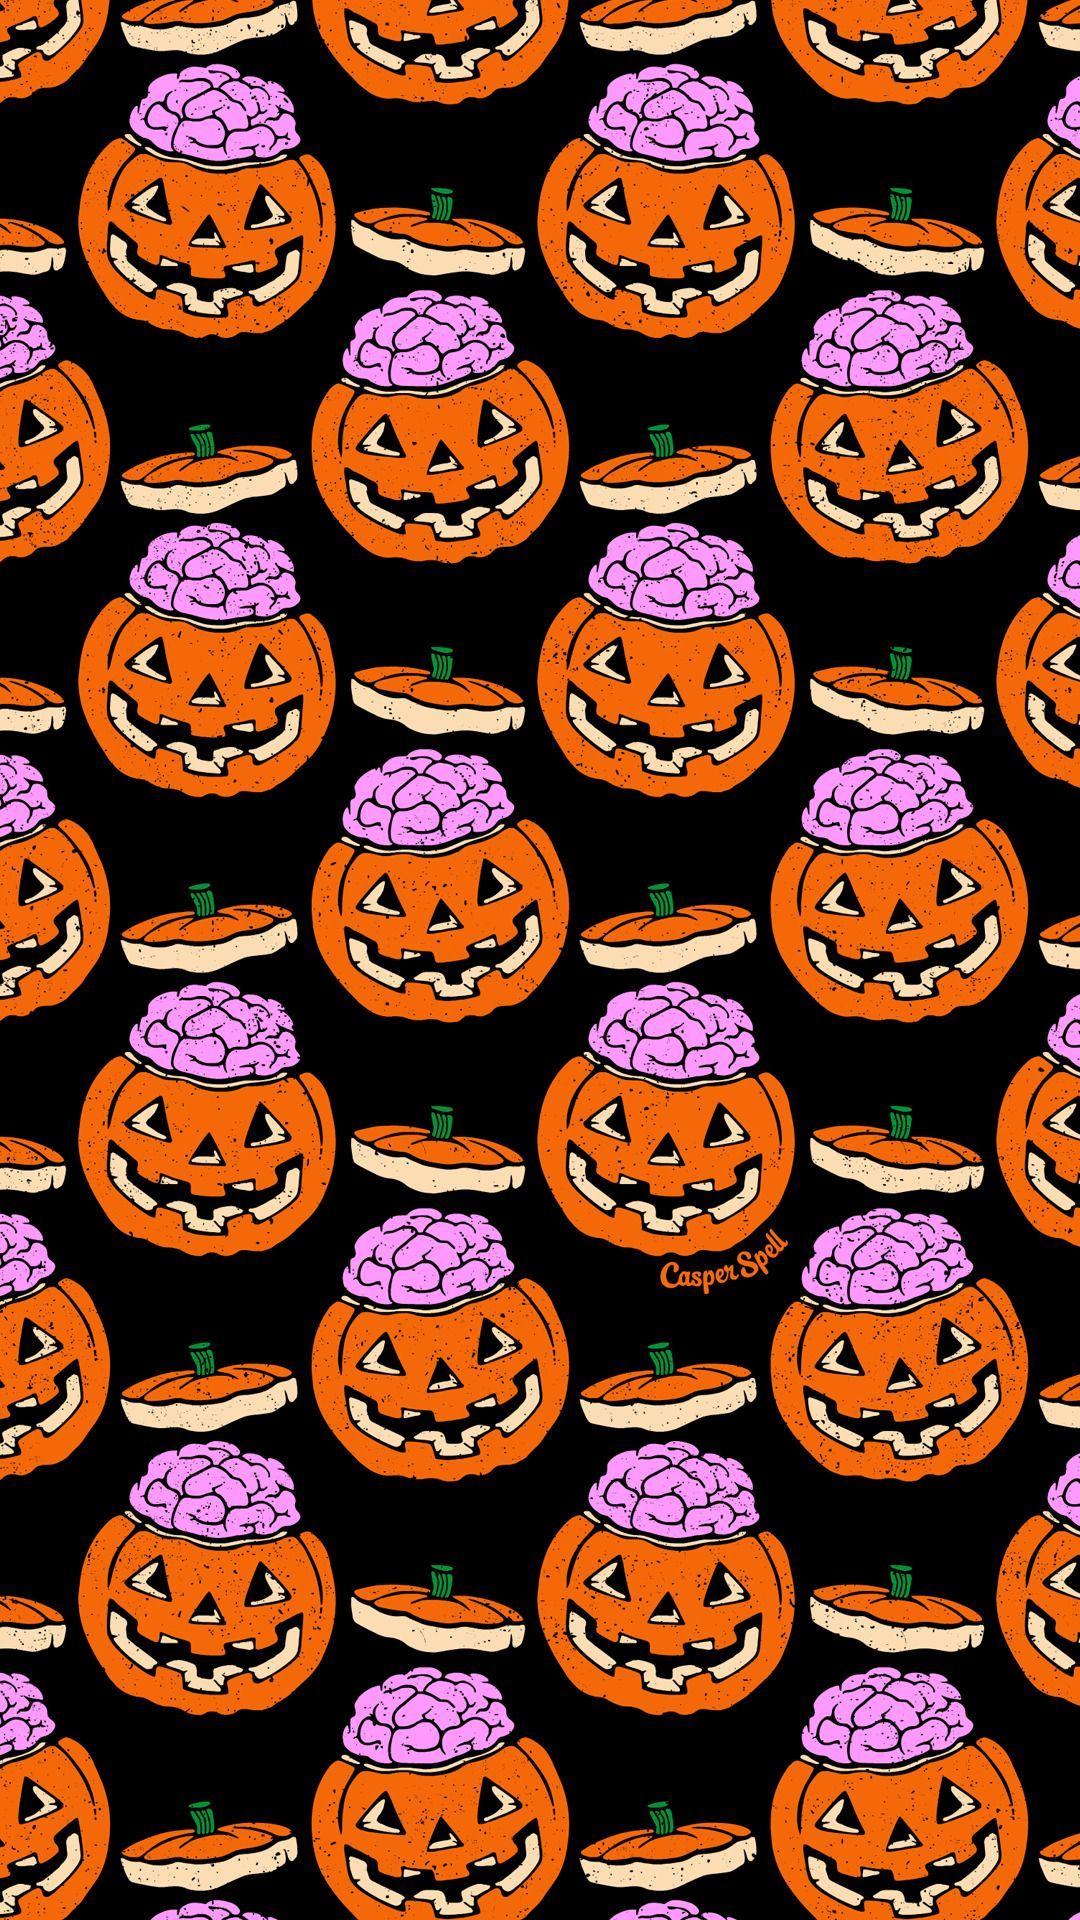 Halloween Wallpaper Halloweenwallpapper Cute Backgrounds 12 Best 1080x1920